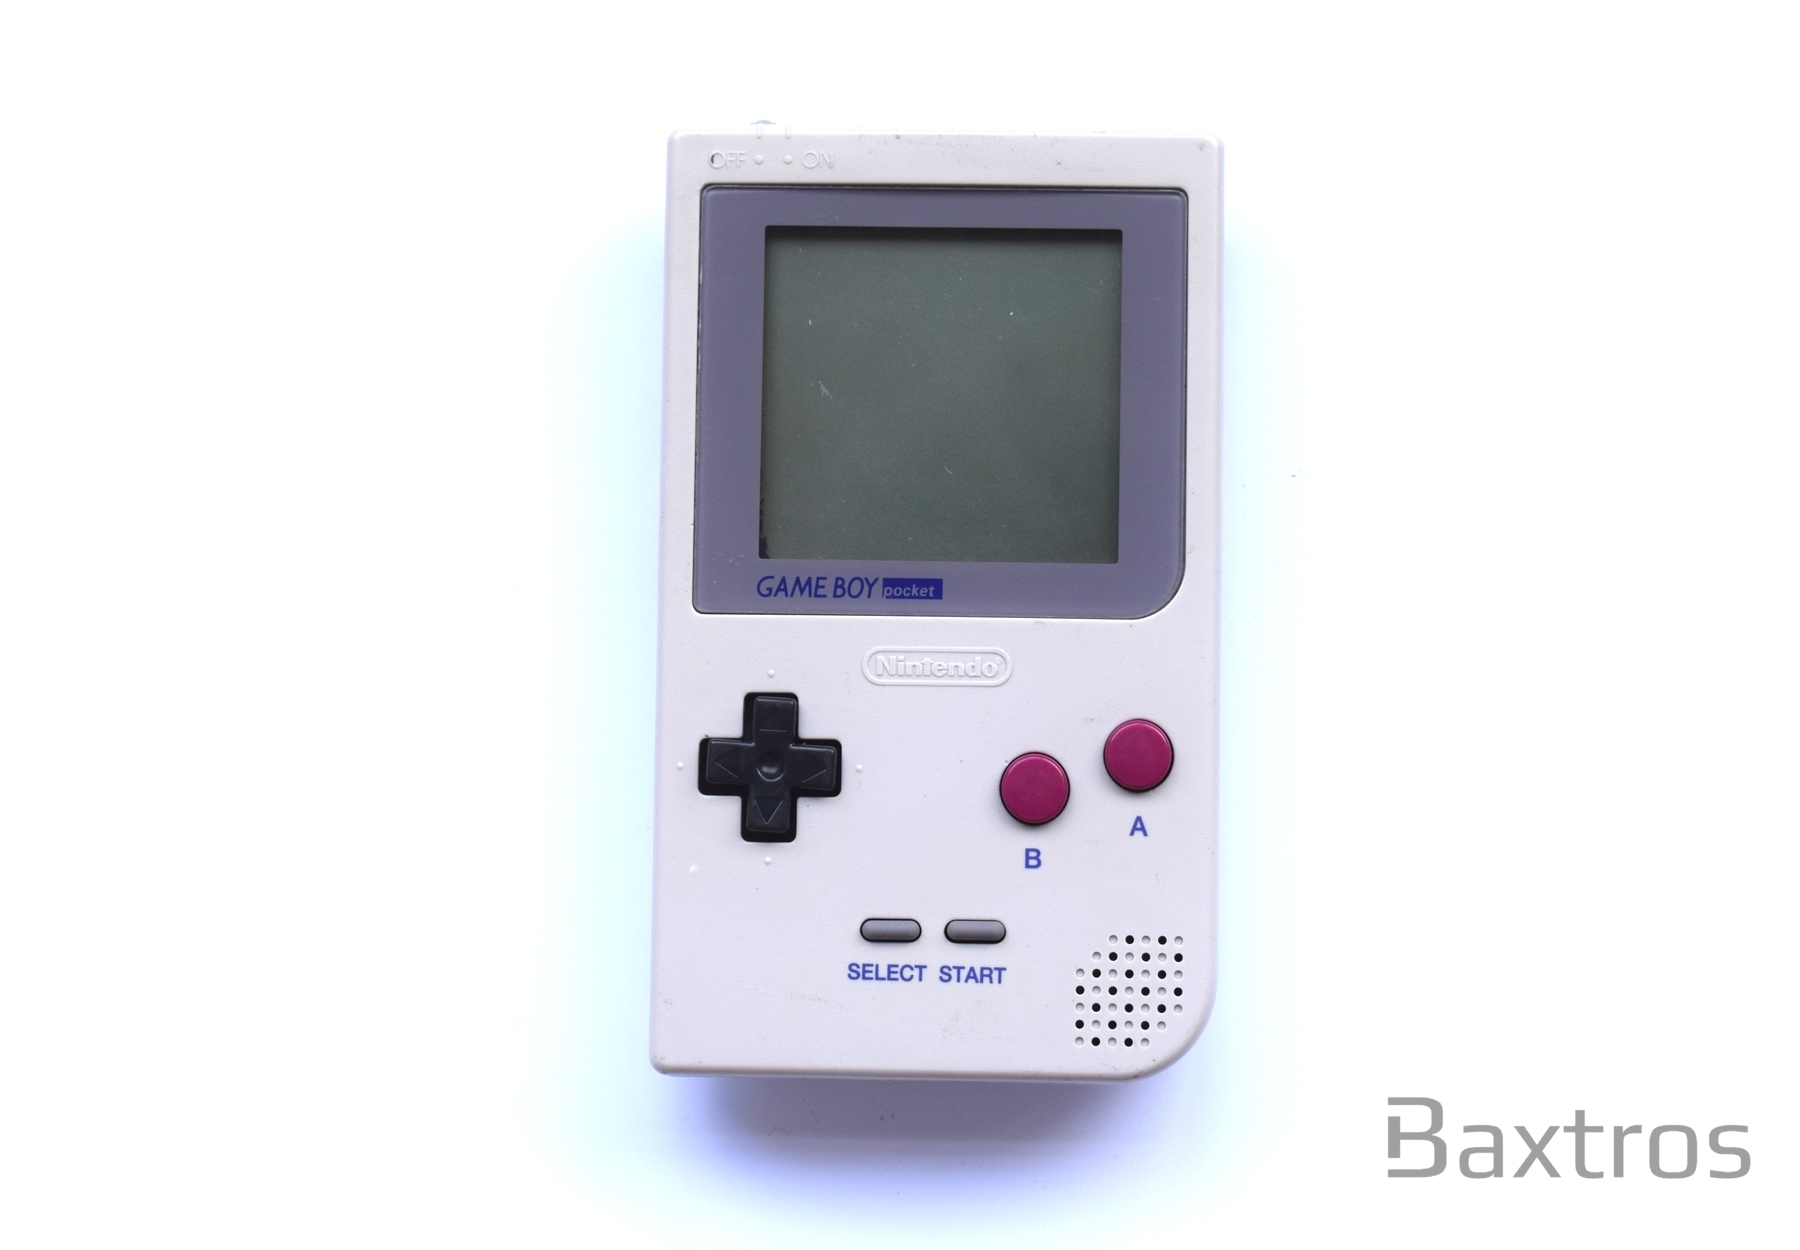 Nintendo Gameboy Pocket Off White DMG 01 Grey Console